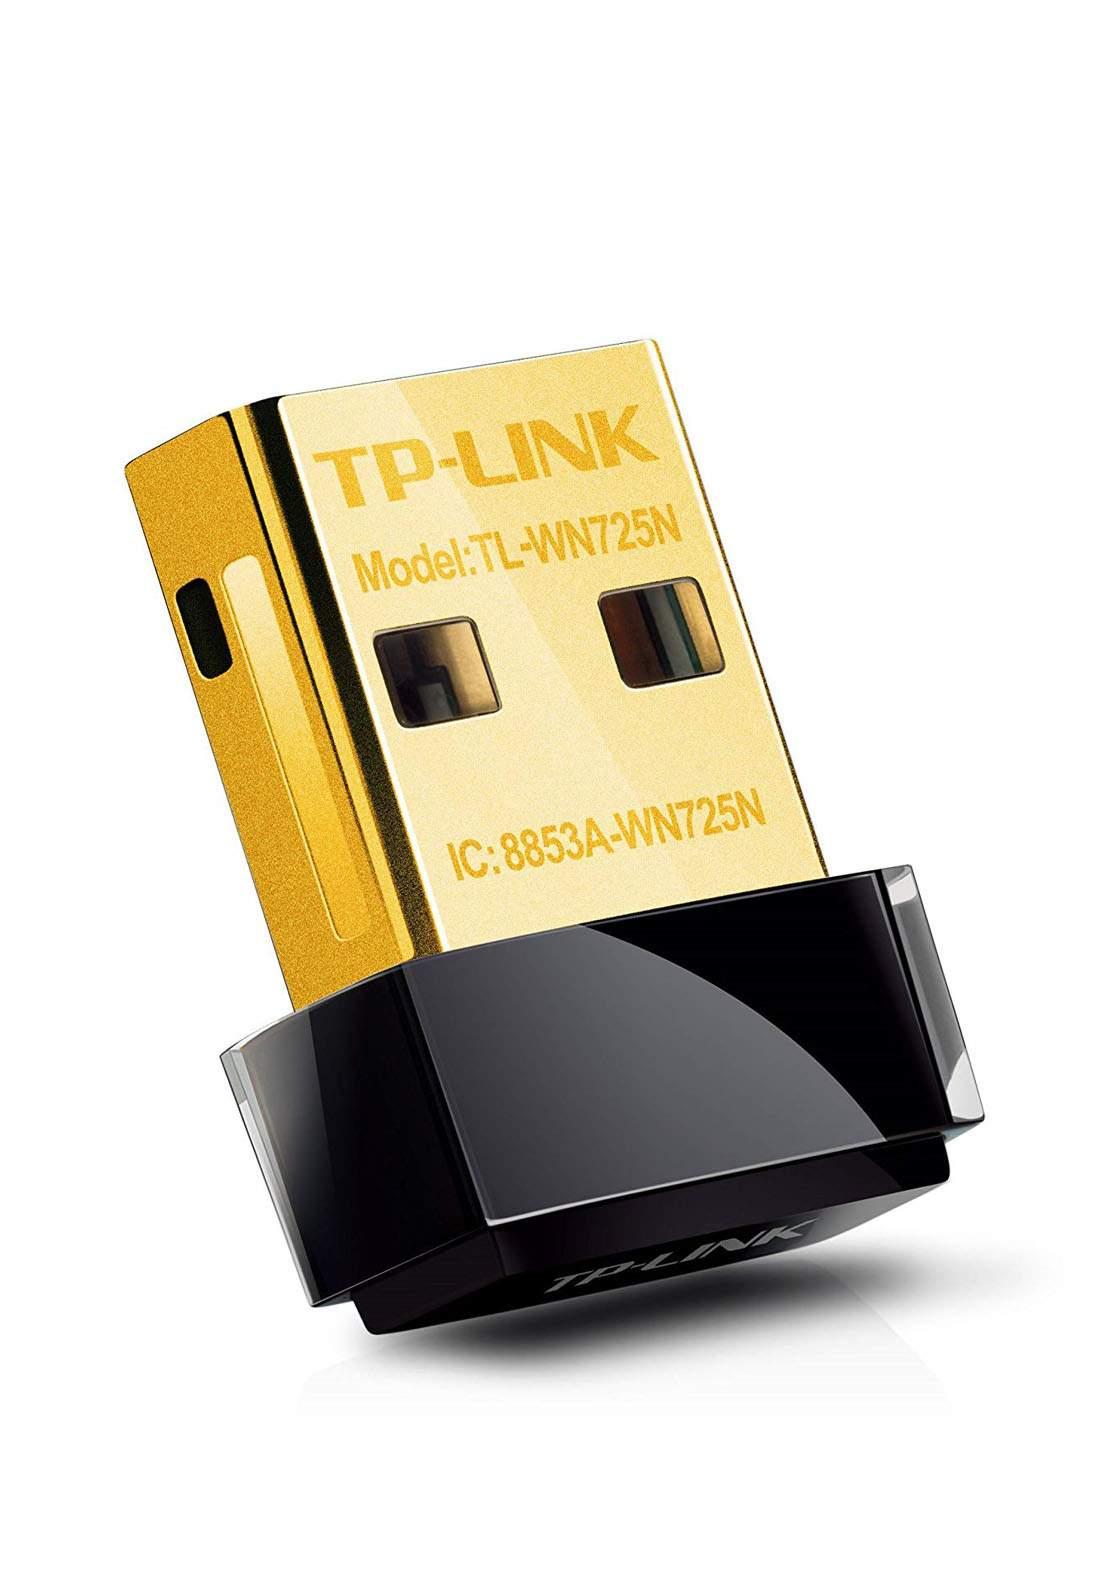 TP-Link TL-WN725N 150Mbps Wireless N Nano USB Adapter - Black